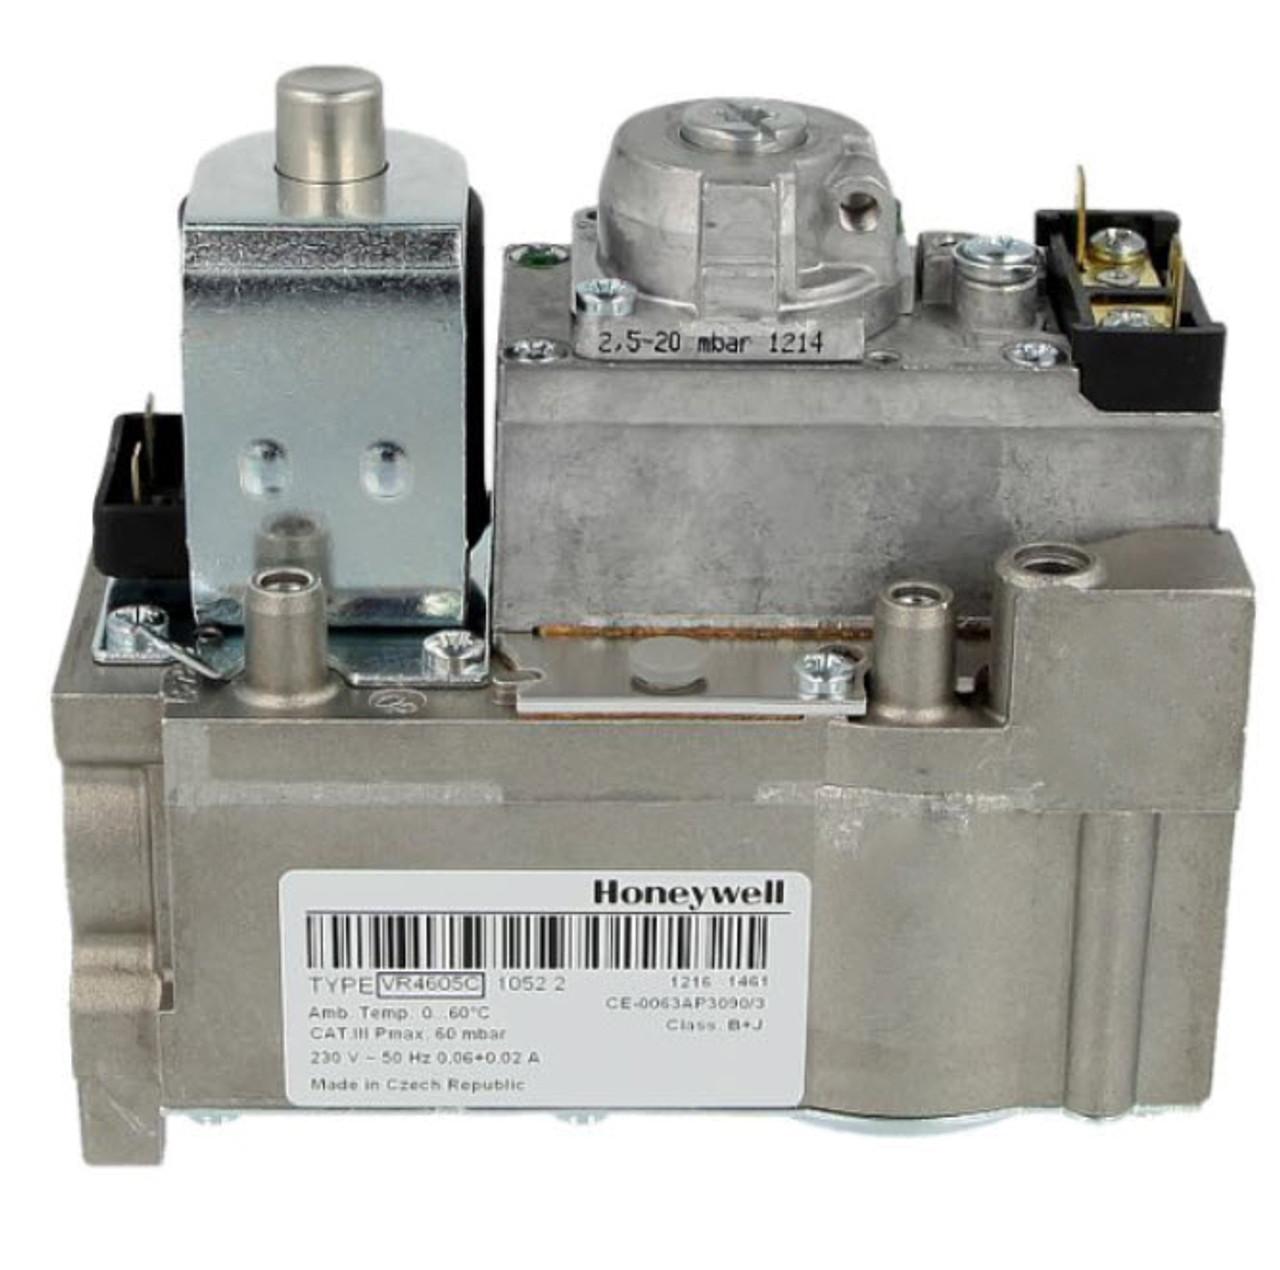 Honeywell VR4605C1052U Gas control block